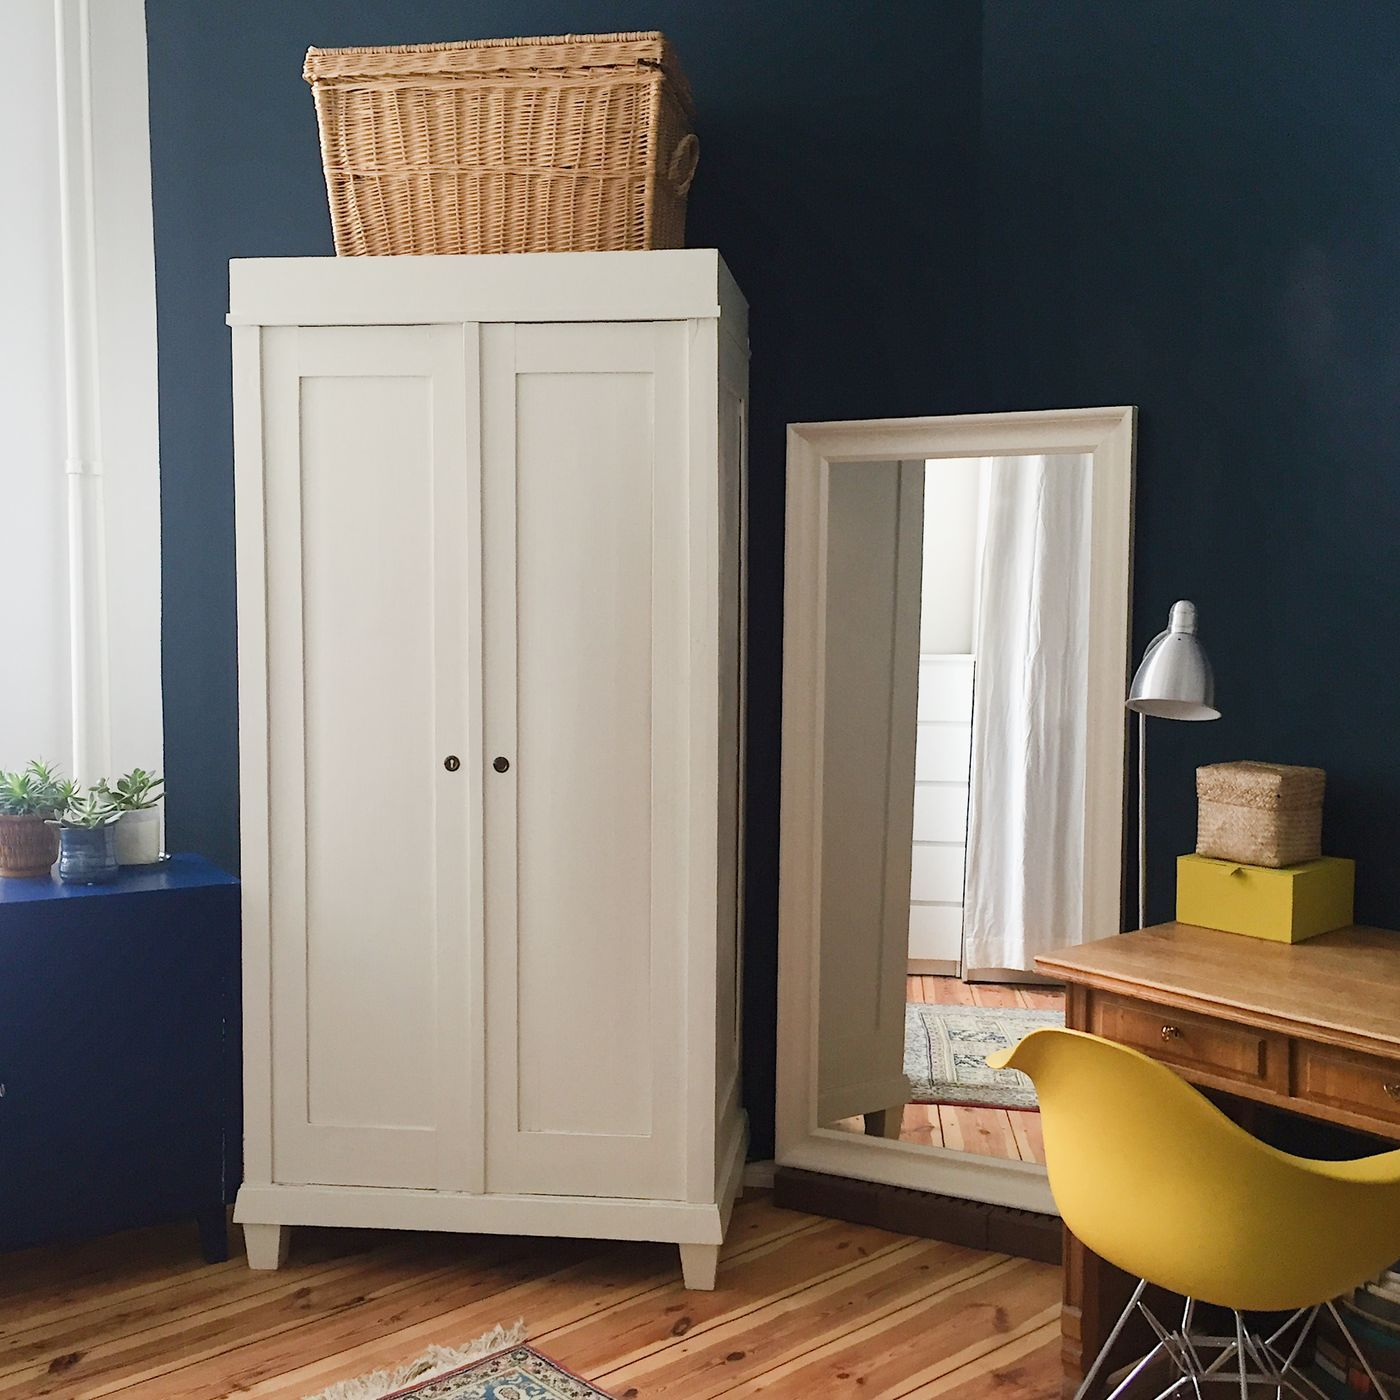 ankleidezimmer gestalten fkh. Black Bedroom Furniture Sets. Home Design Ideas